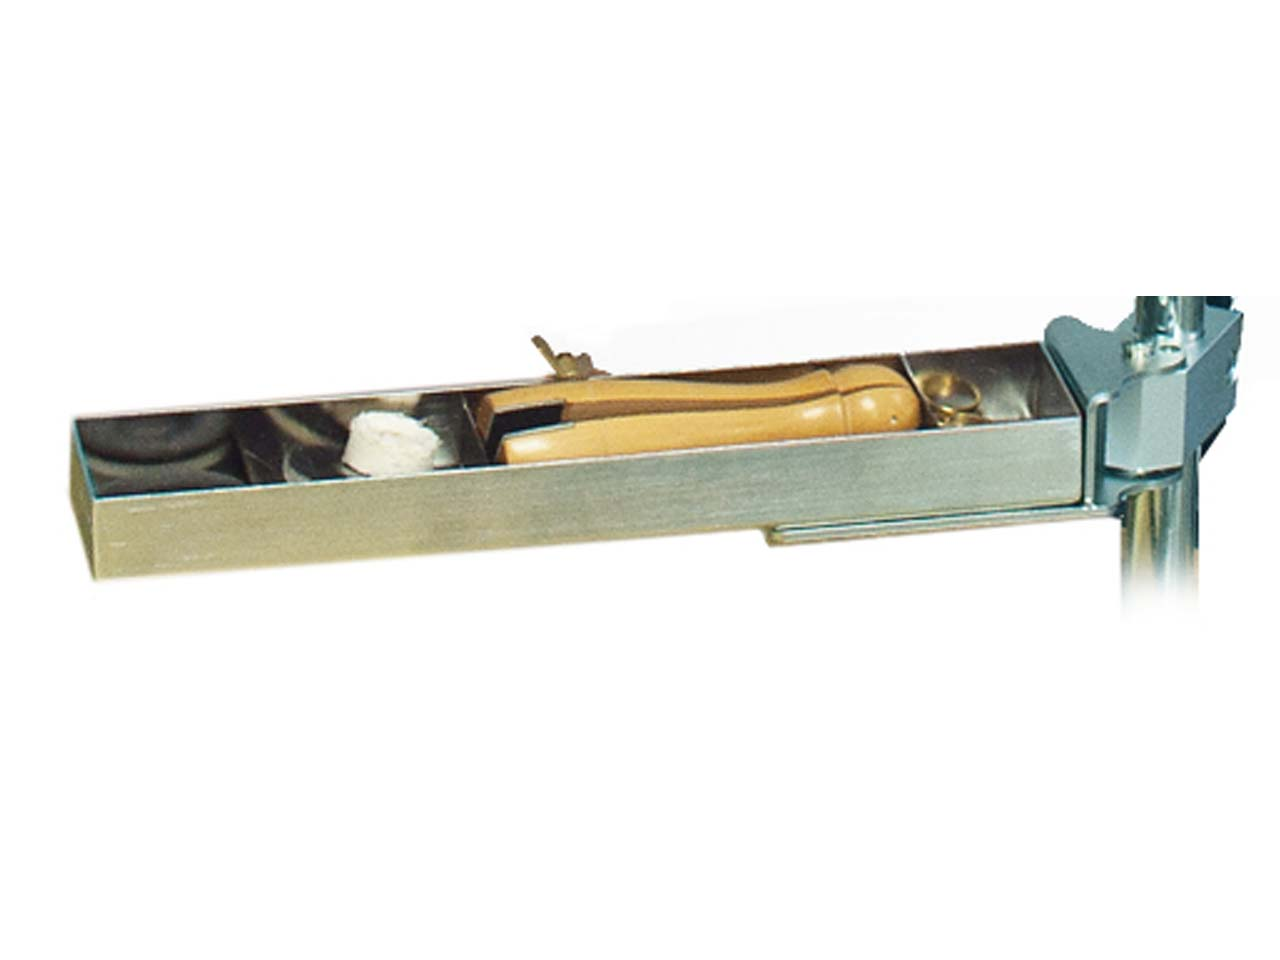 Genuine-US-Foredom-Workbench-Accessories-System miniatura 51